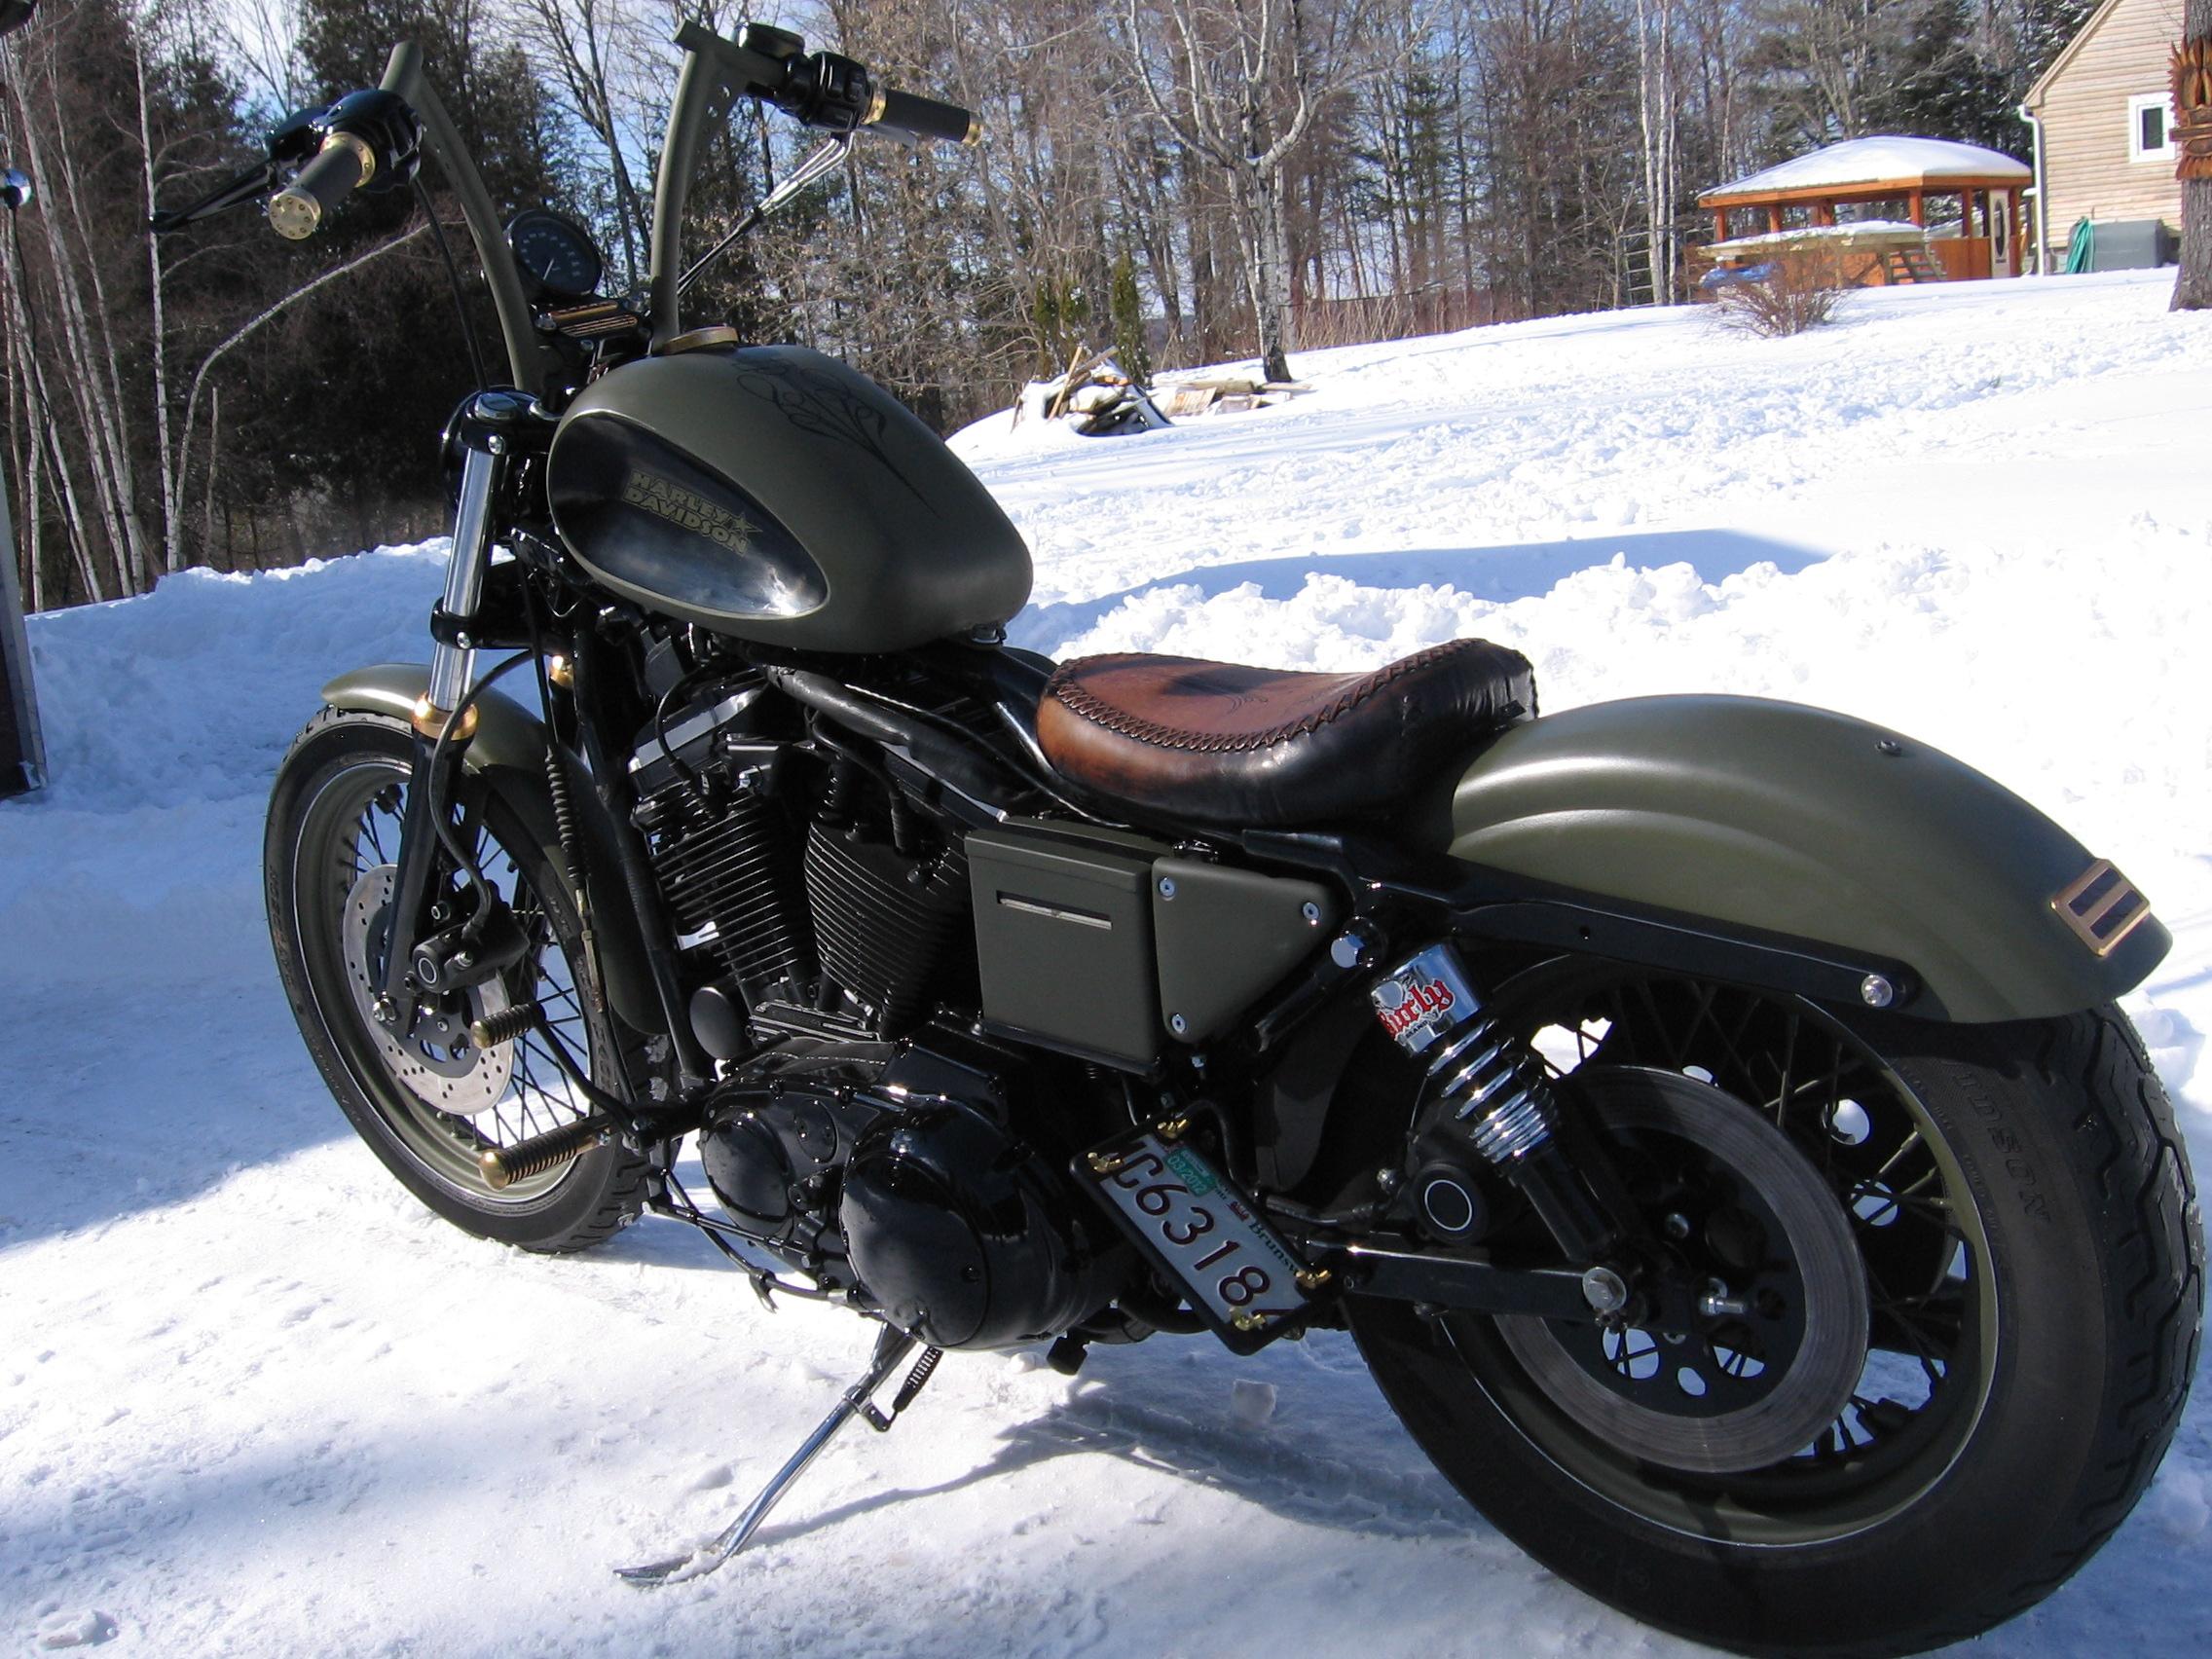 Wanda's Bike047